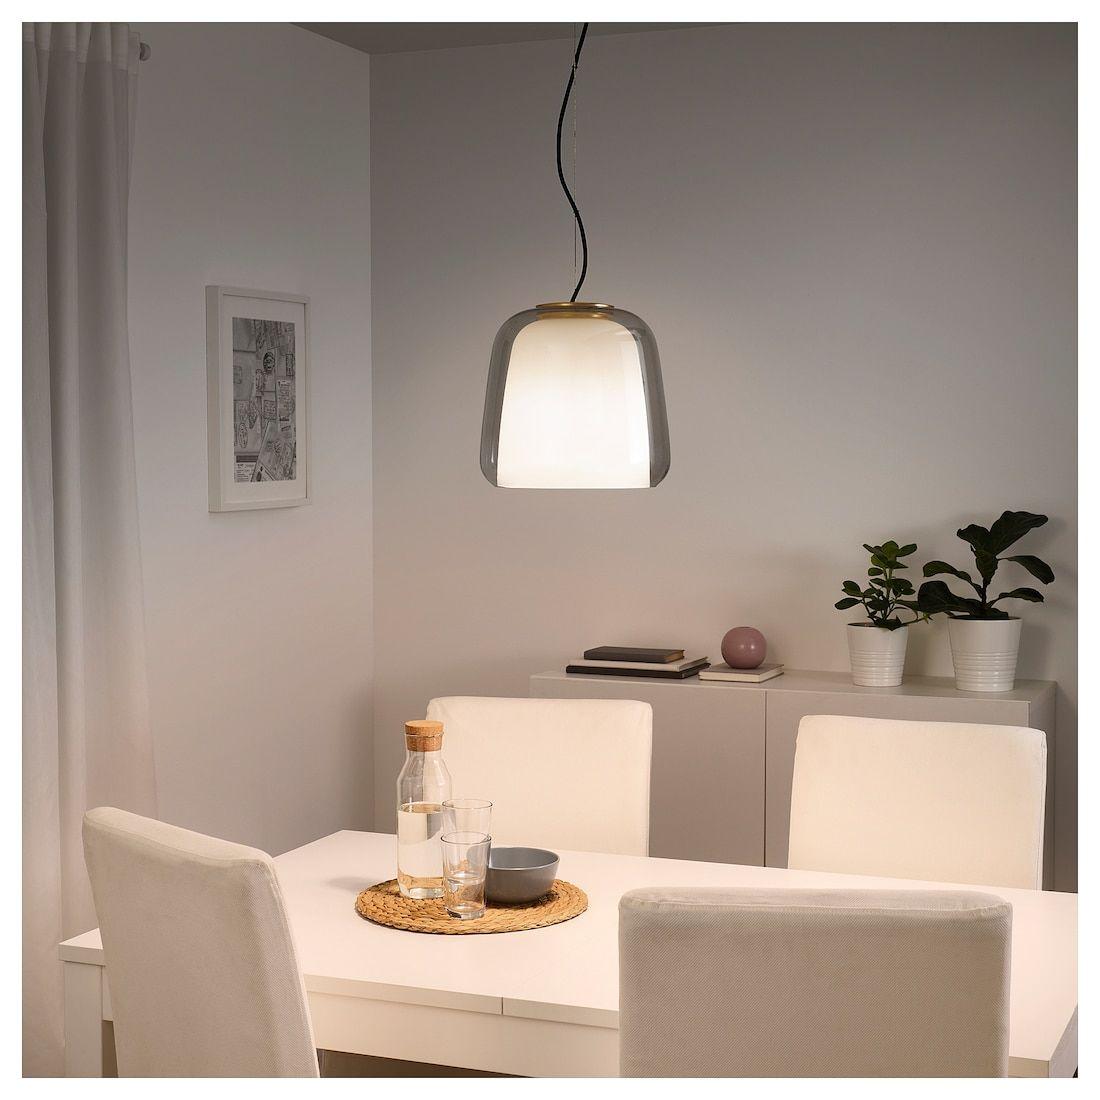 EVEDAL Pendant lamp gray Pendant lamp, Cool floor